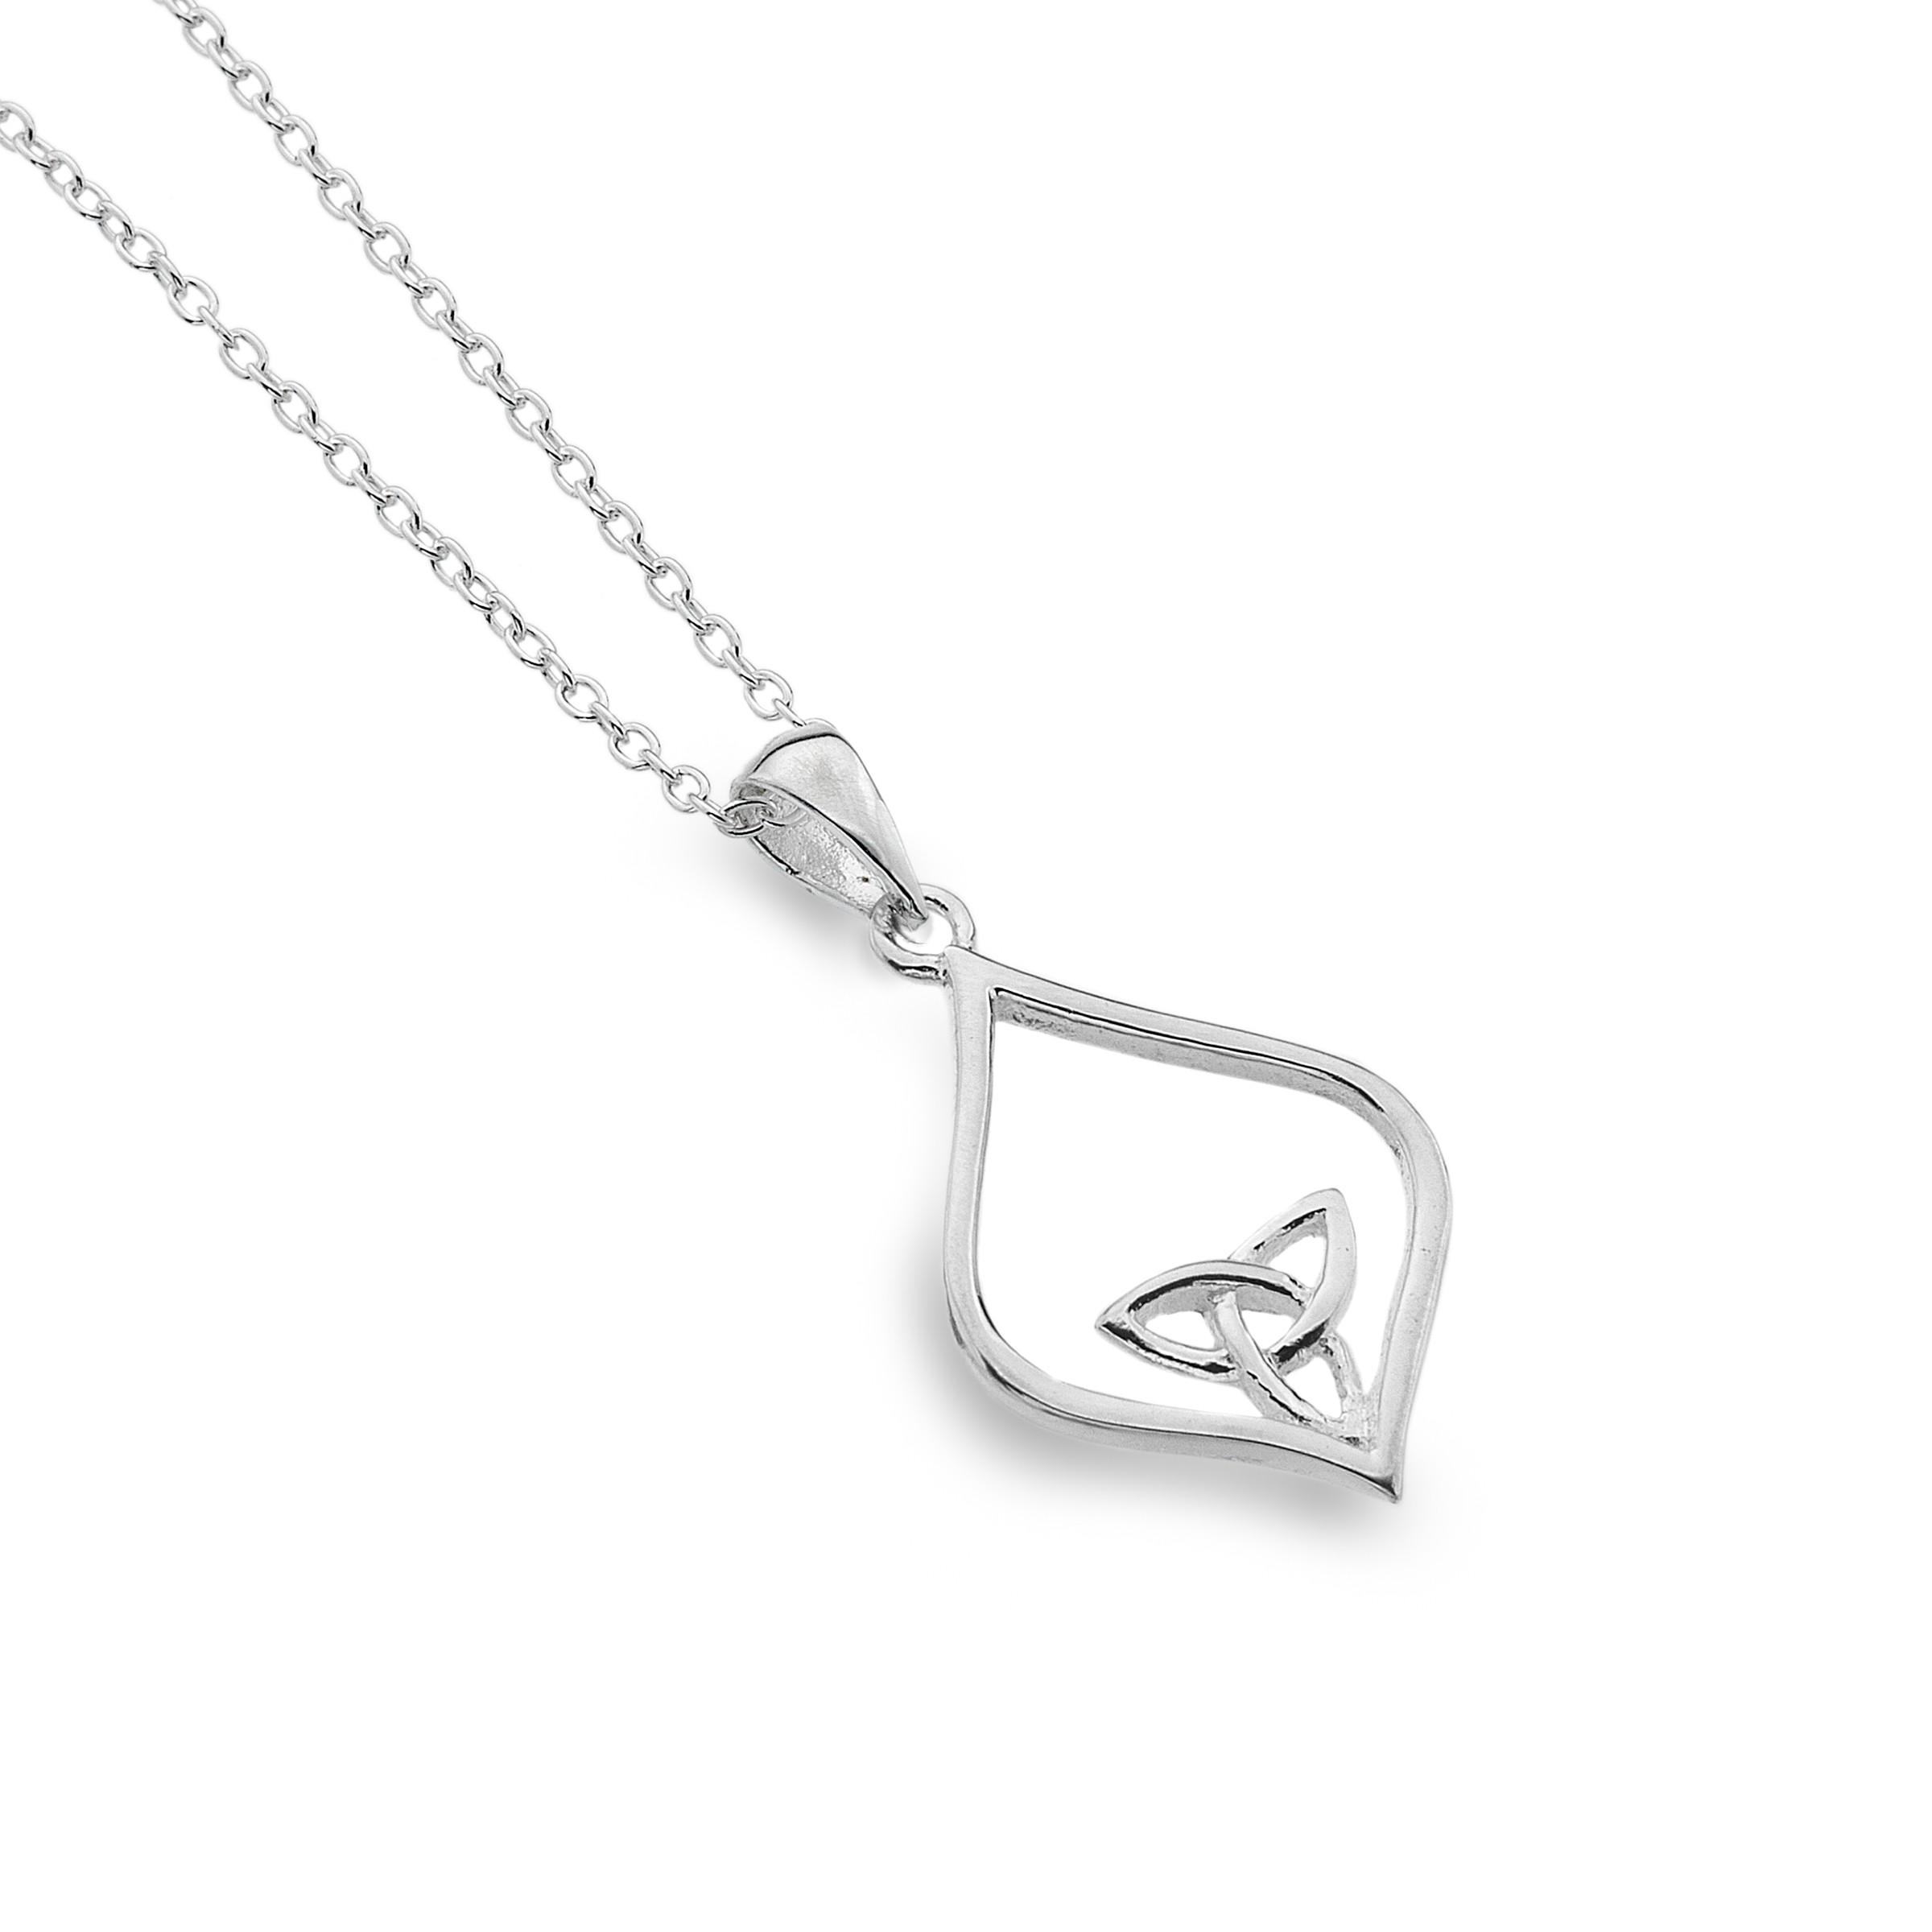 Celtic Trinity Knot Oval Point Sterling Silver Pendant Necklace